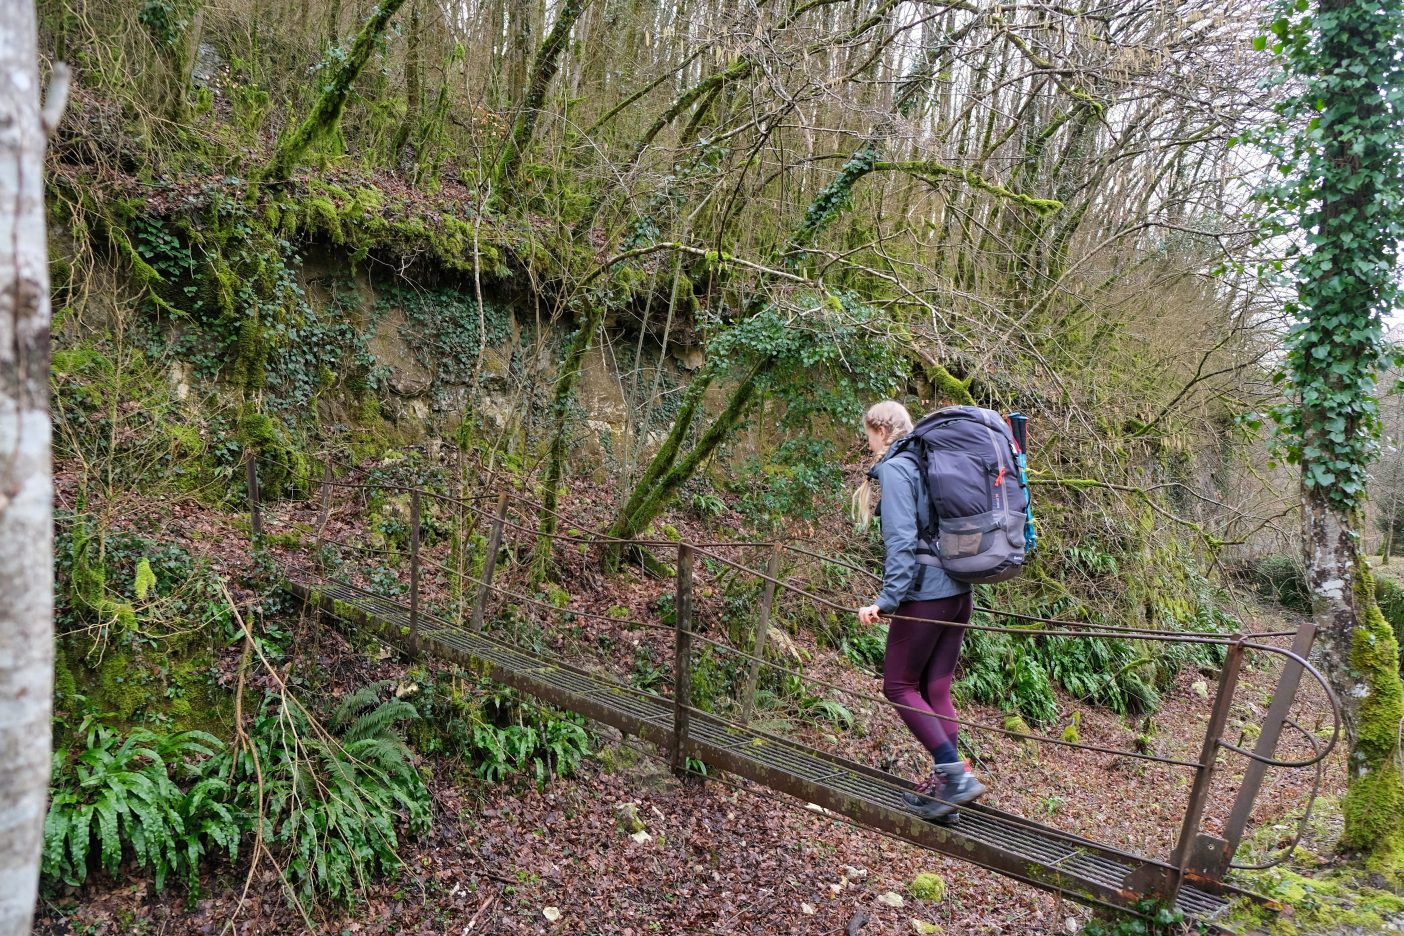 Girl hiking with big backpack